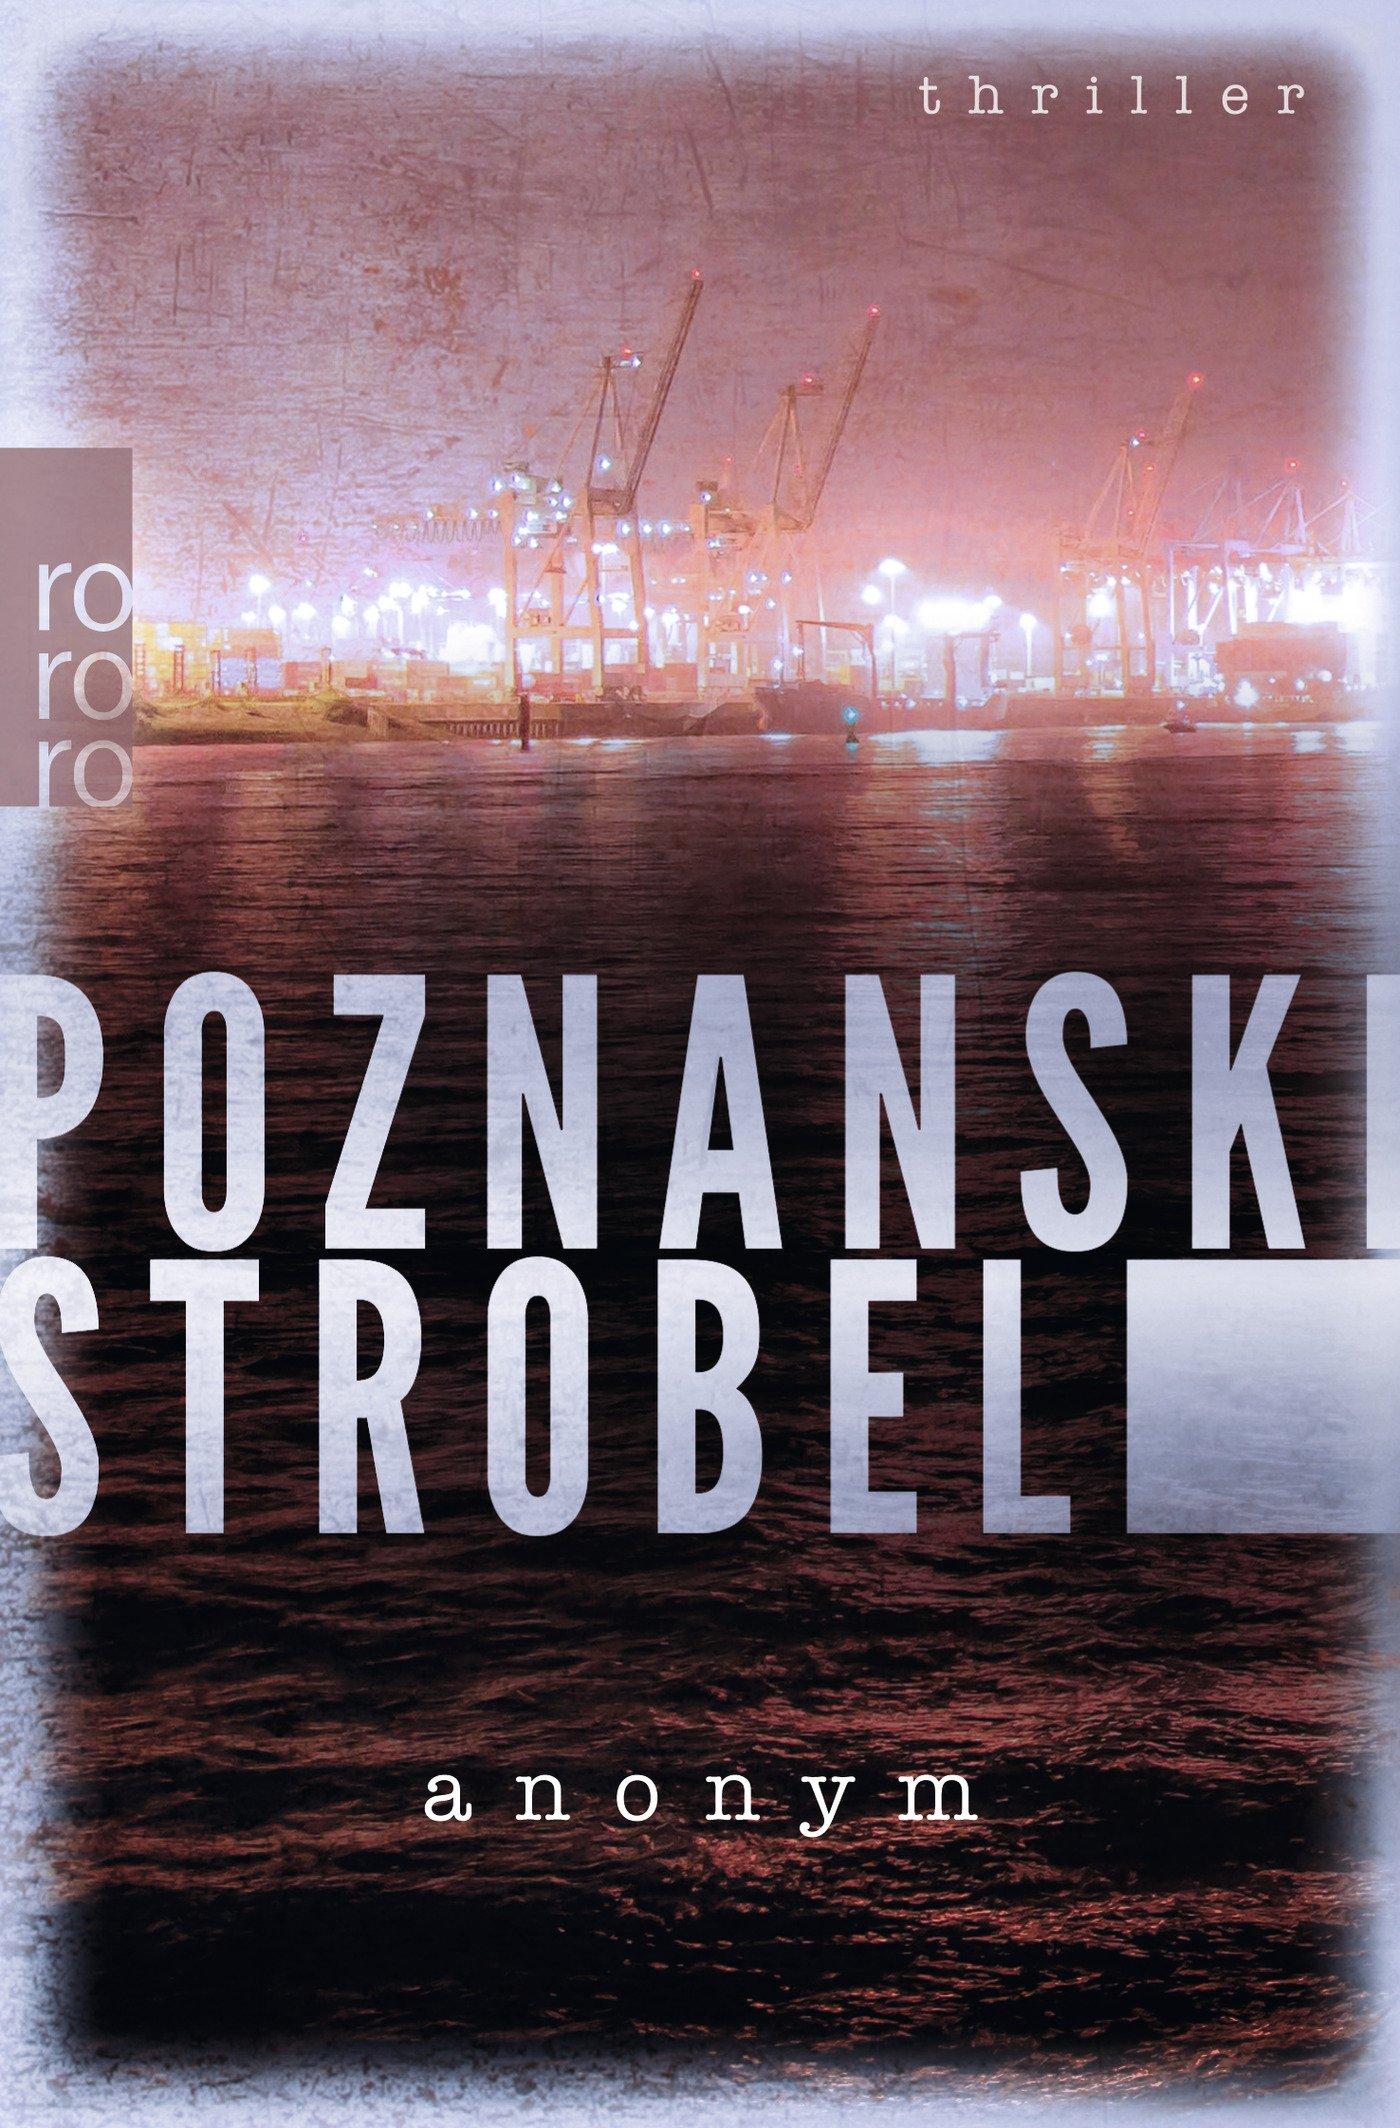 Anonym Taschenbuch – 27. März 2018 Ursula Poznanski Arno Strobel Rowohlt Taschenbuch 3499270927